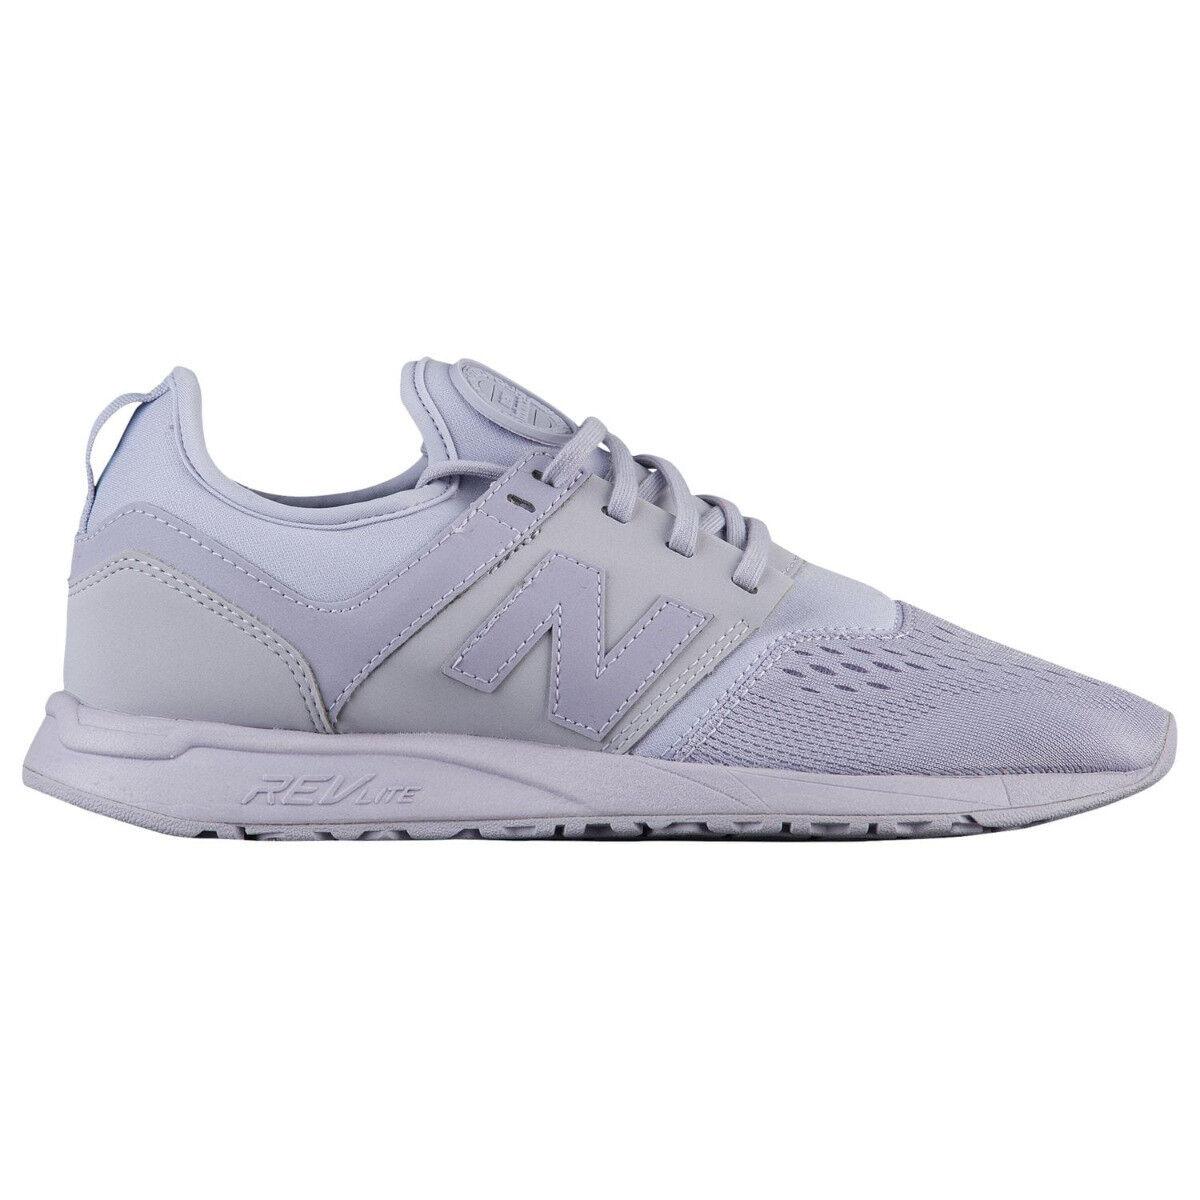 NEW Women's New Balance WRL247MS Cosmic Sky Shoes  Size: 9-B NWOB